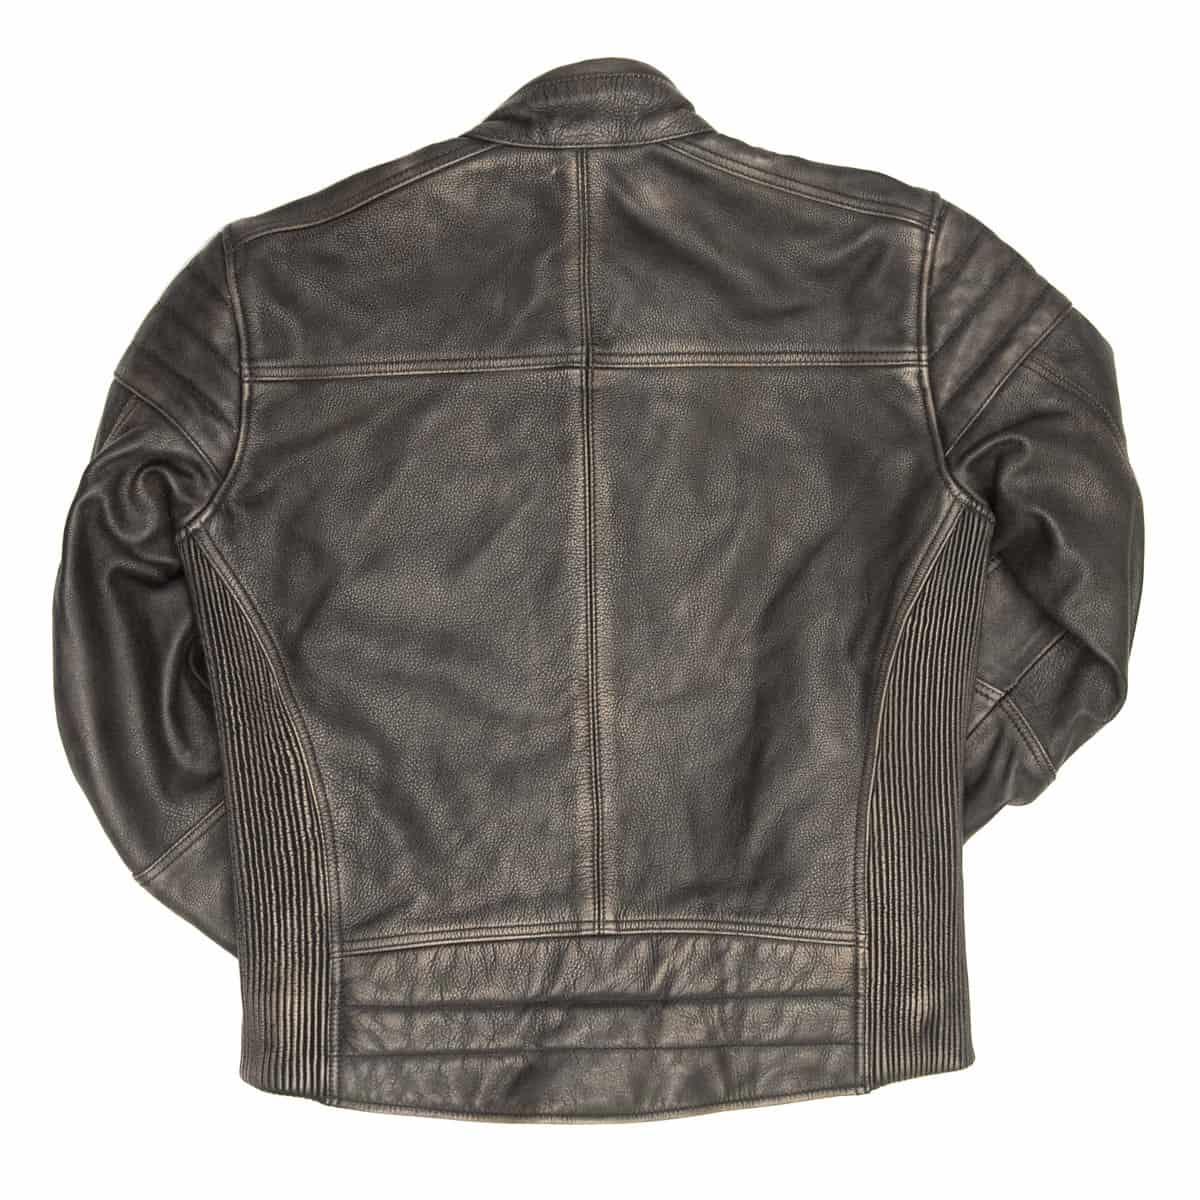 Age Of Glory: The Rocker Black Leather Motorcycle Jacket